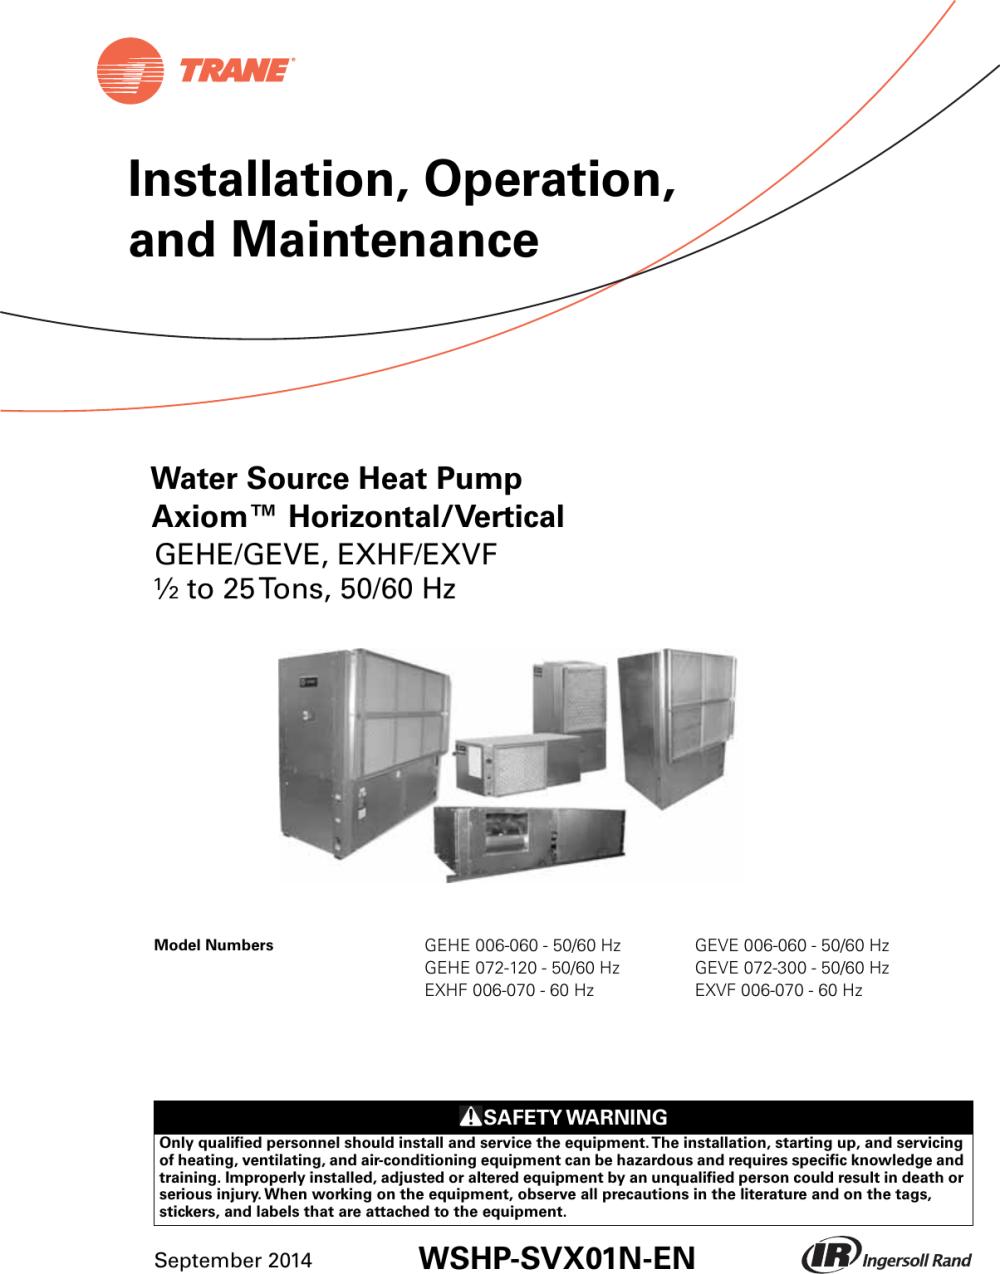 medium resolution of uc400 trane wiring diagram wiring diagram centretrane h v wshp 5 to 25 tons installation and maintenance